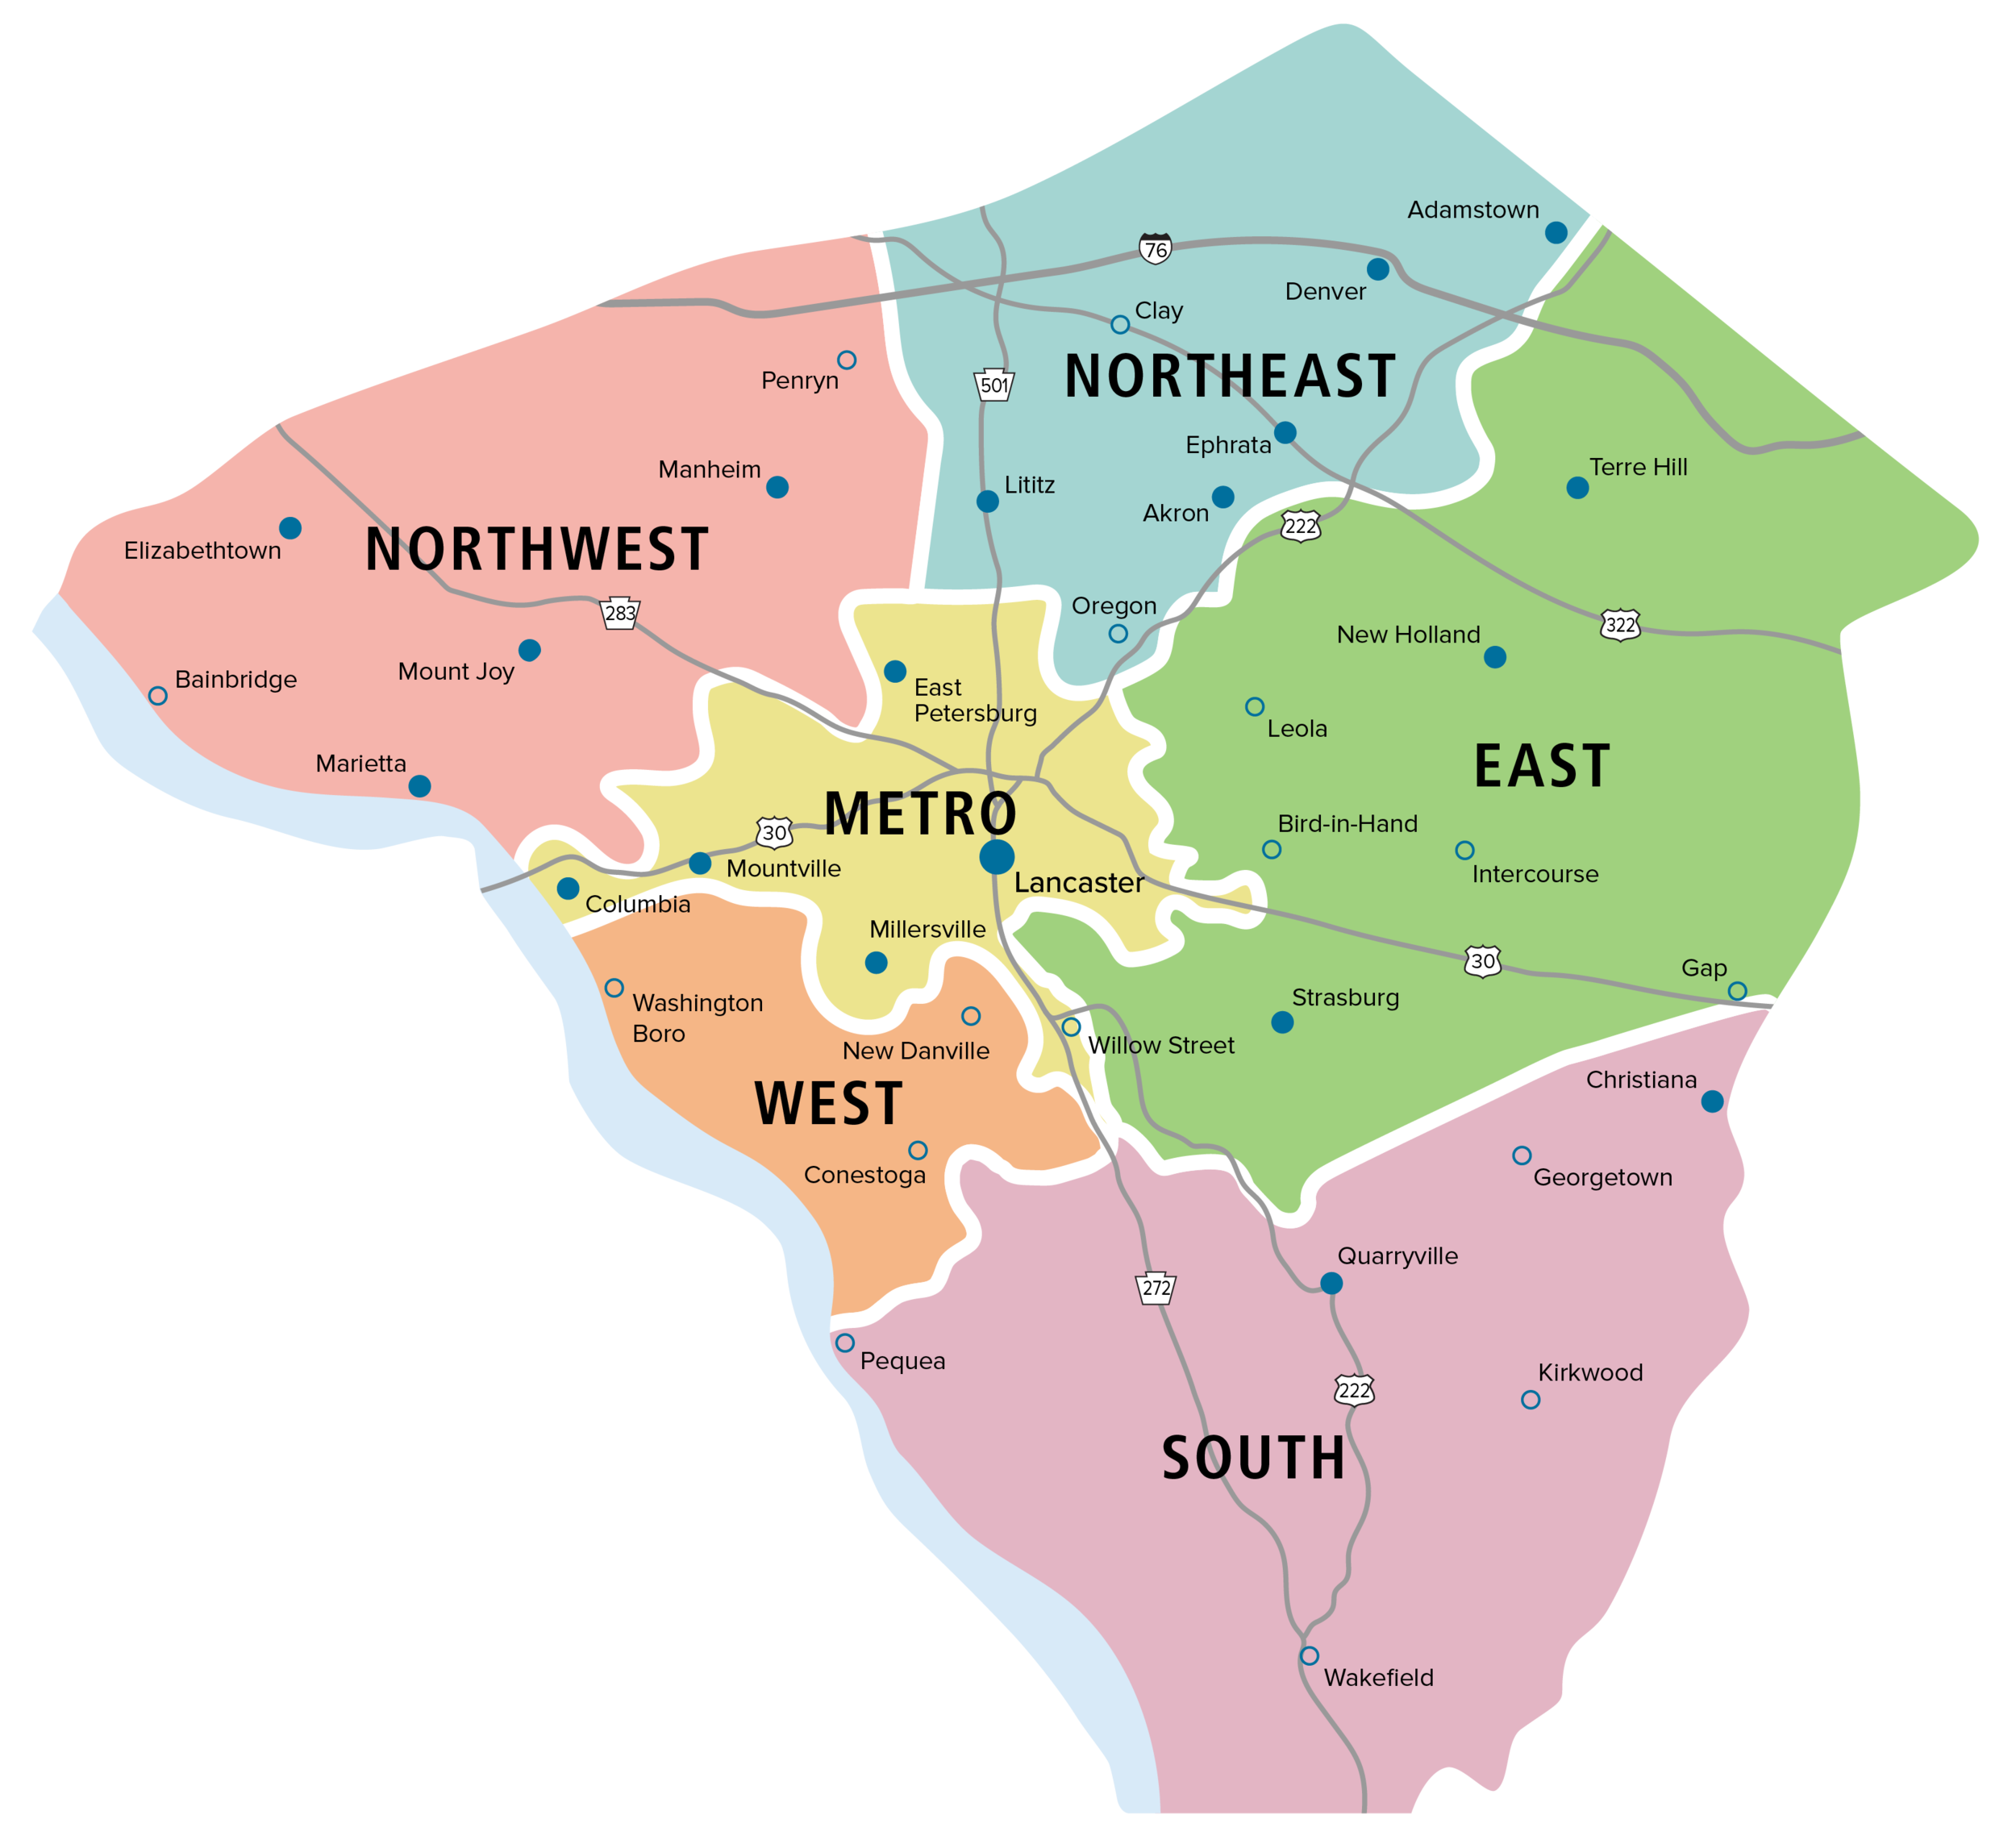 816x730_stylized county map-regions_web-v5.png